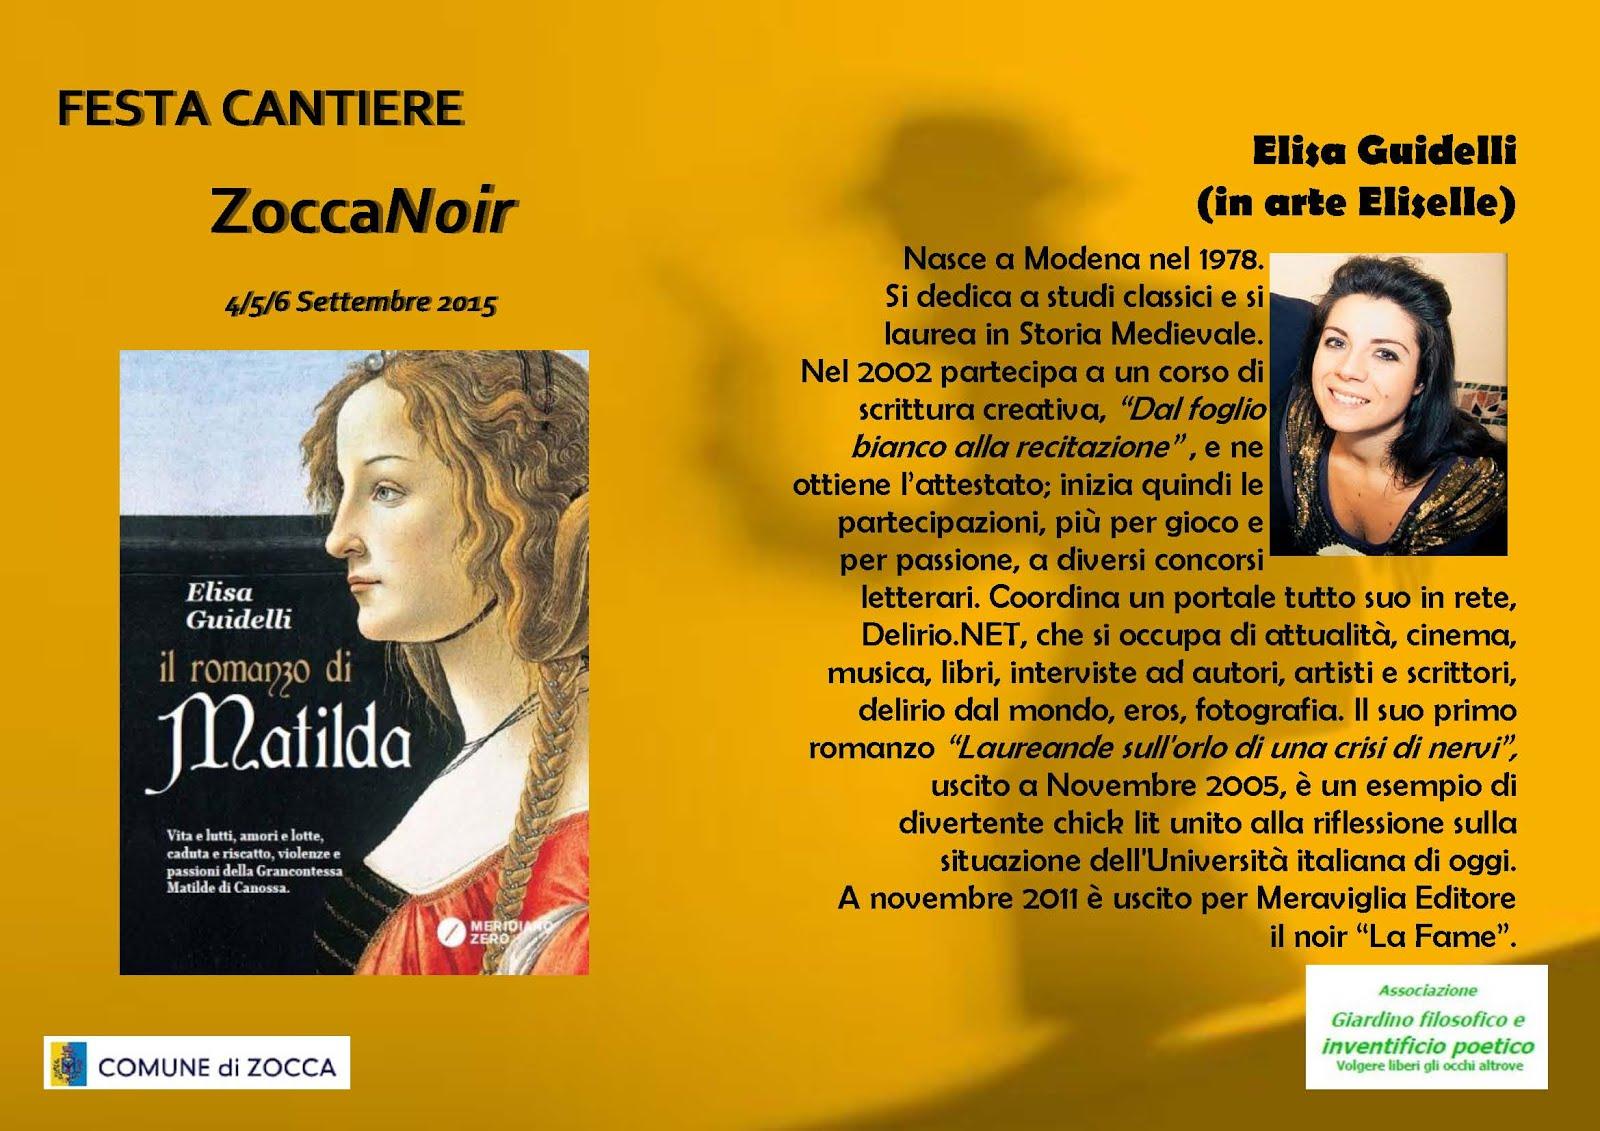 Biografia Elisa Guidelli